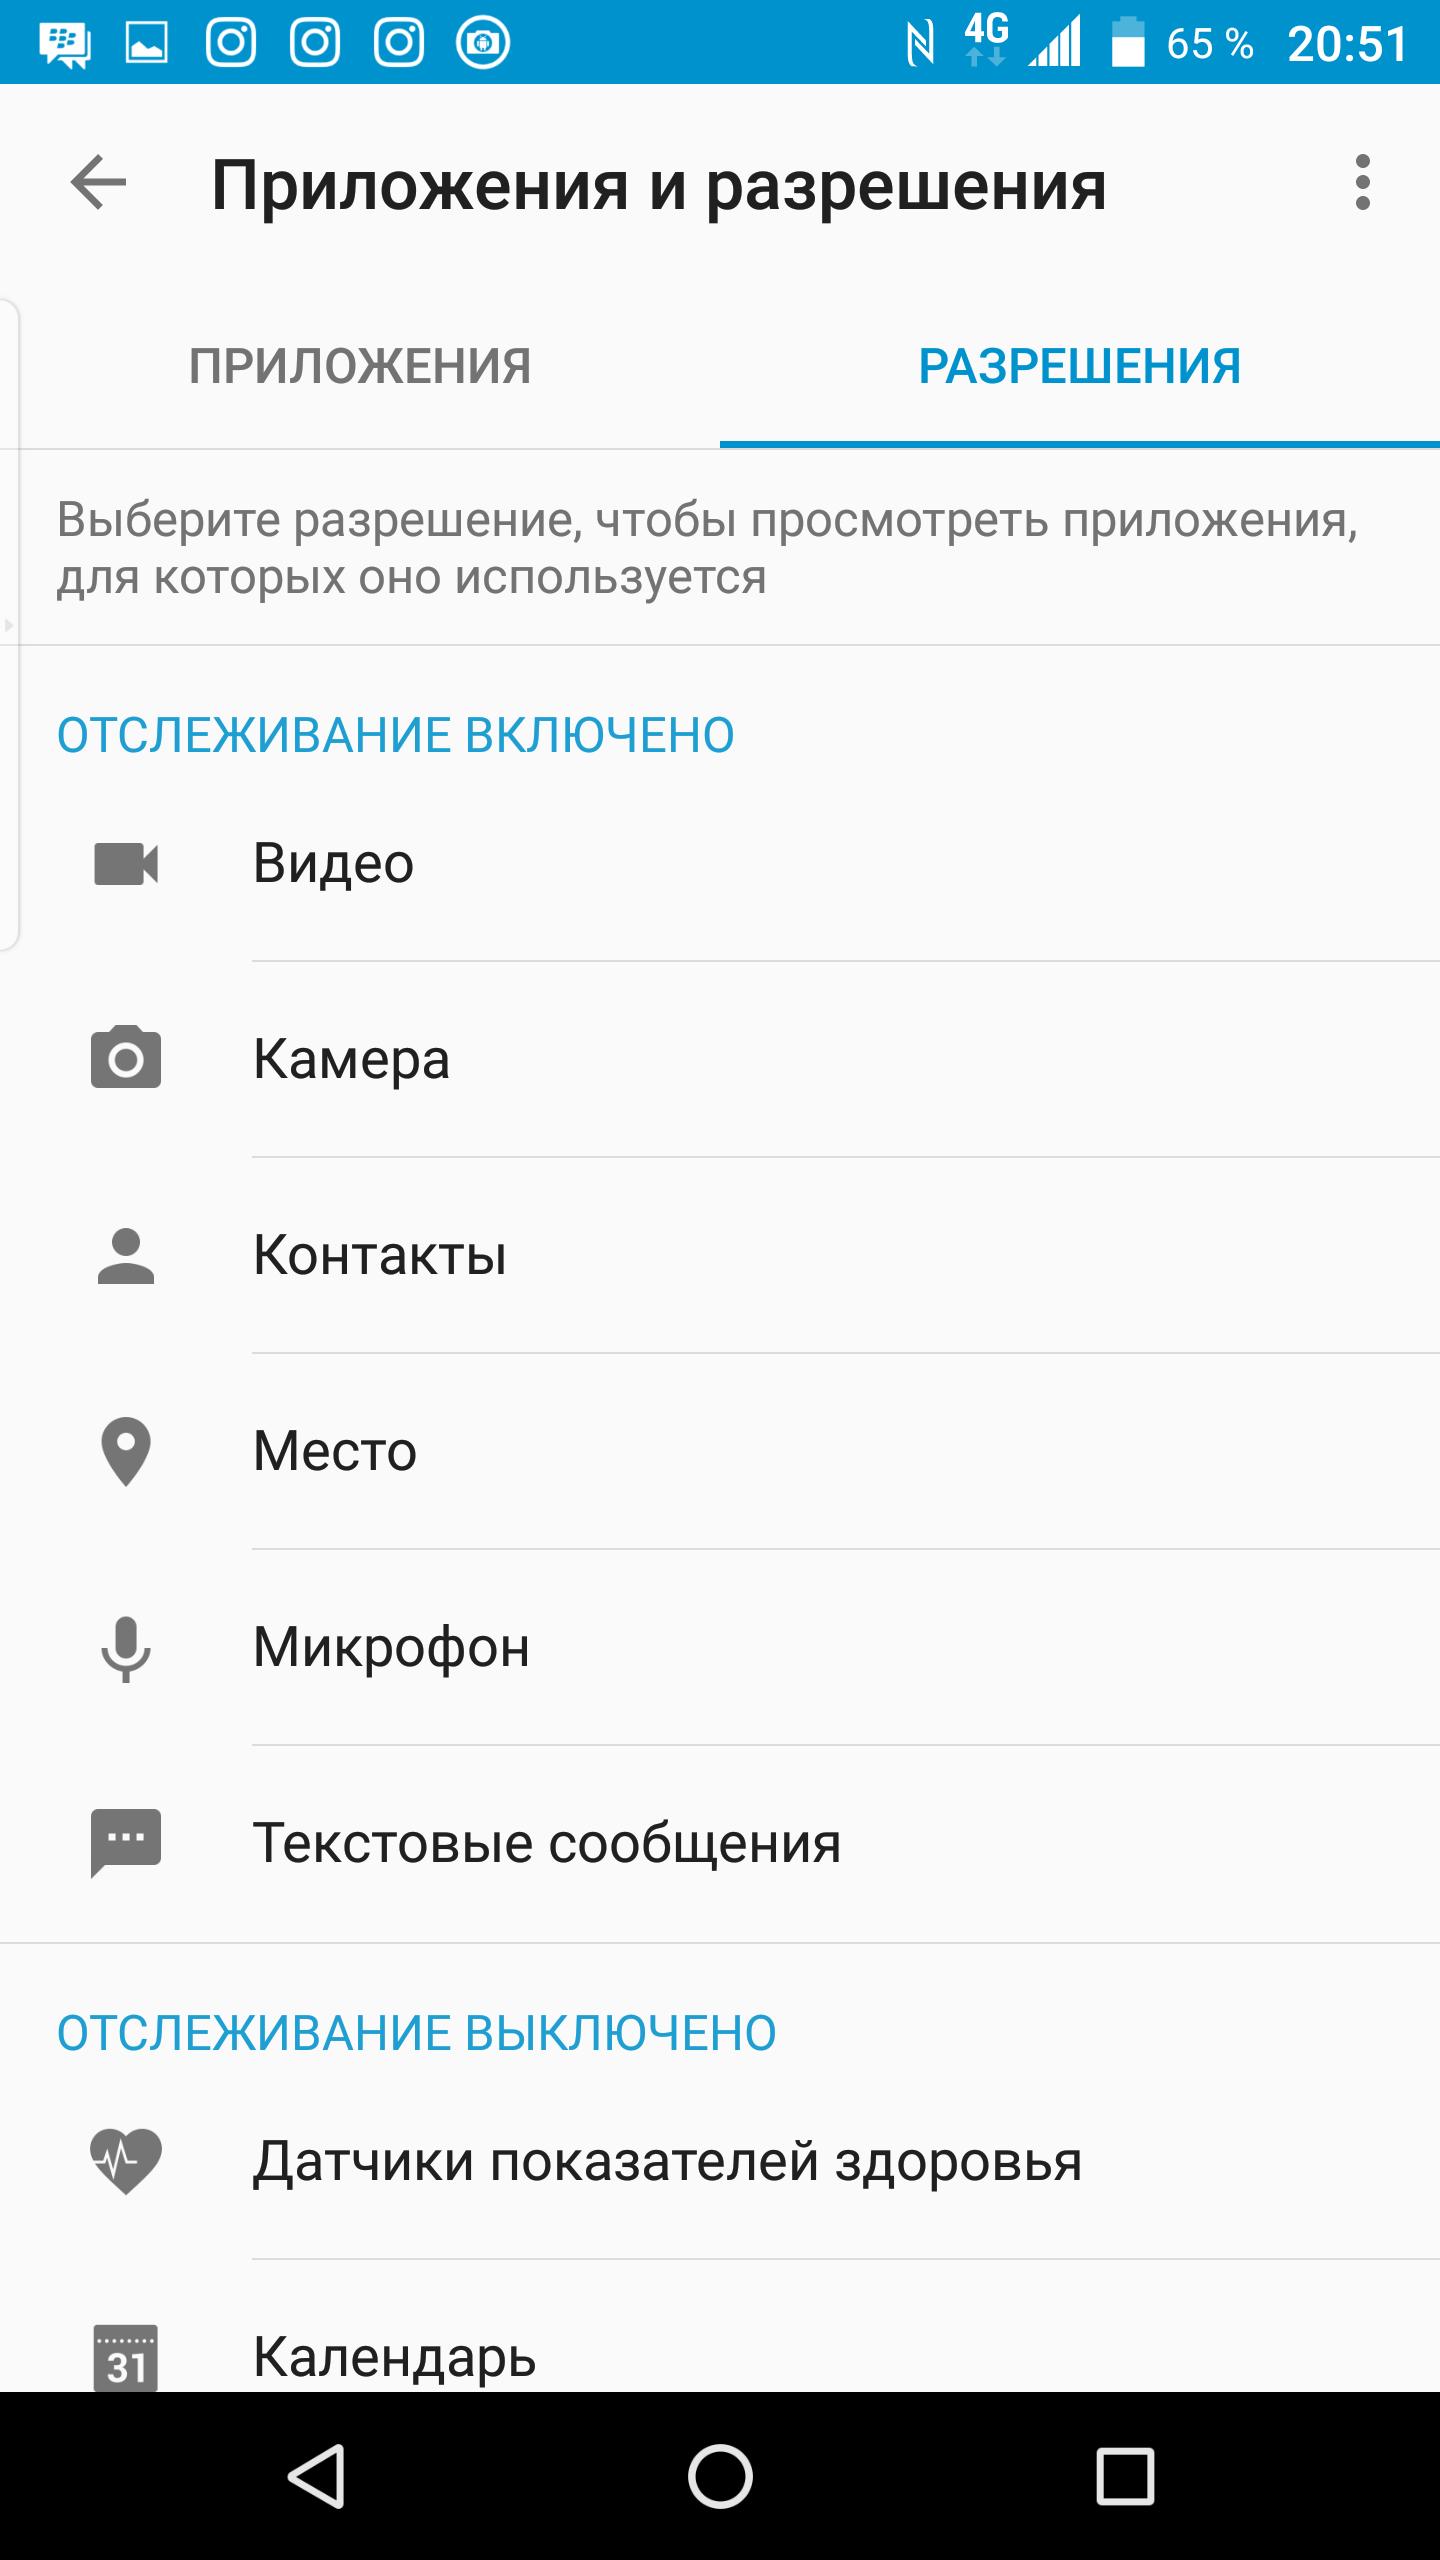 screenshot_20161108-205138